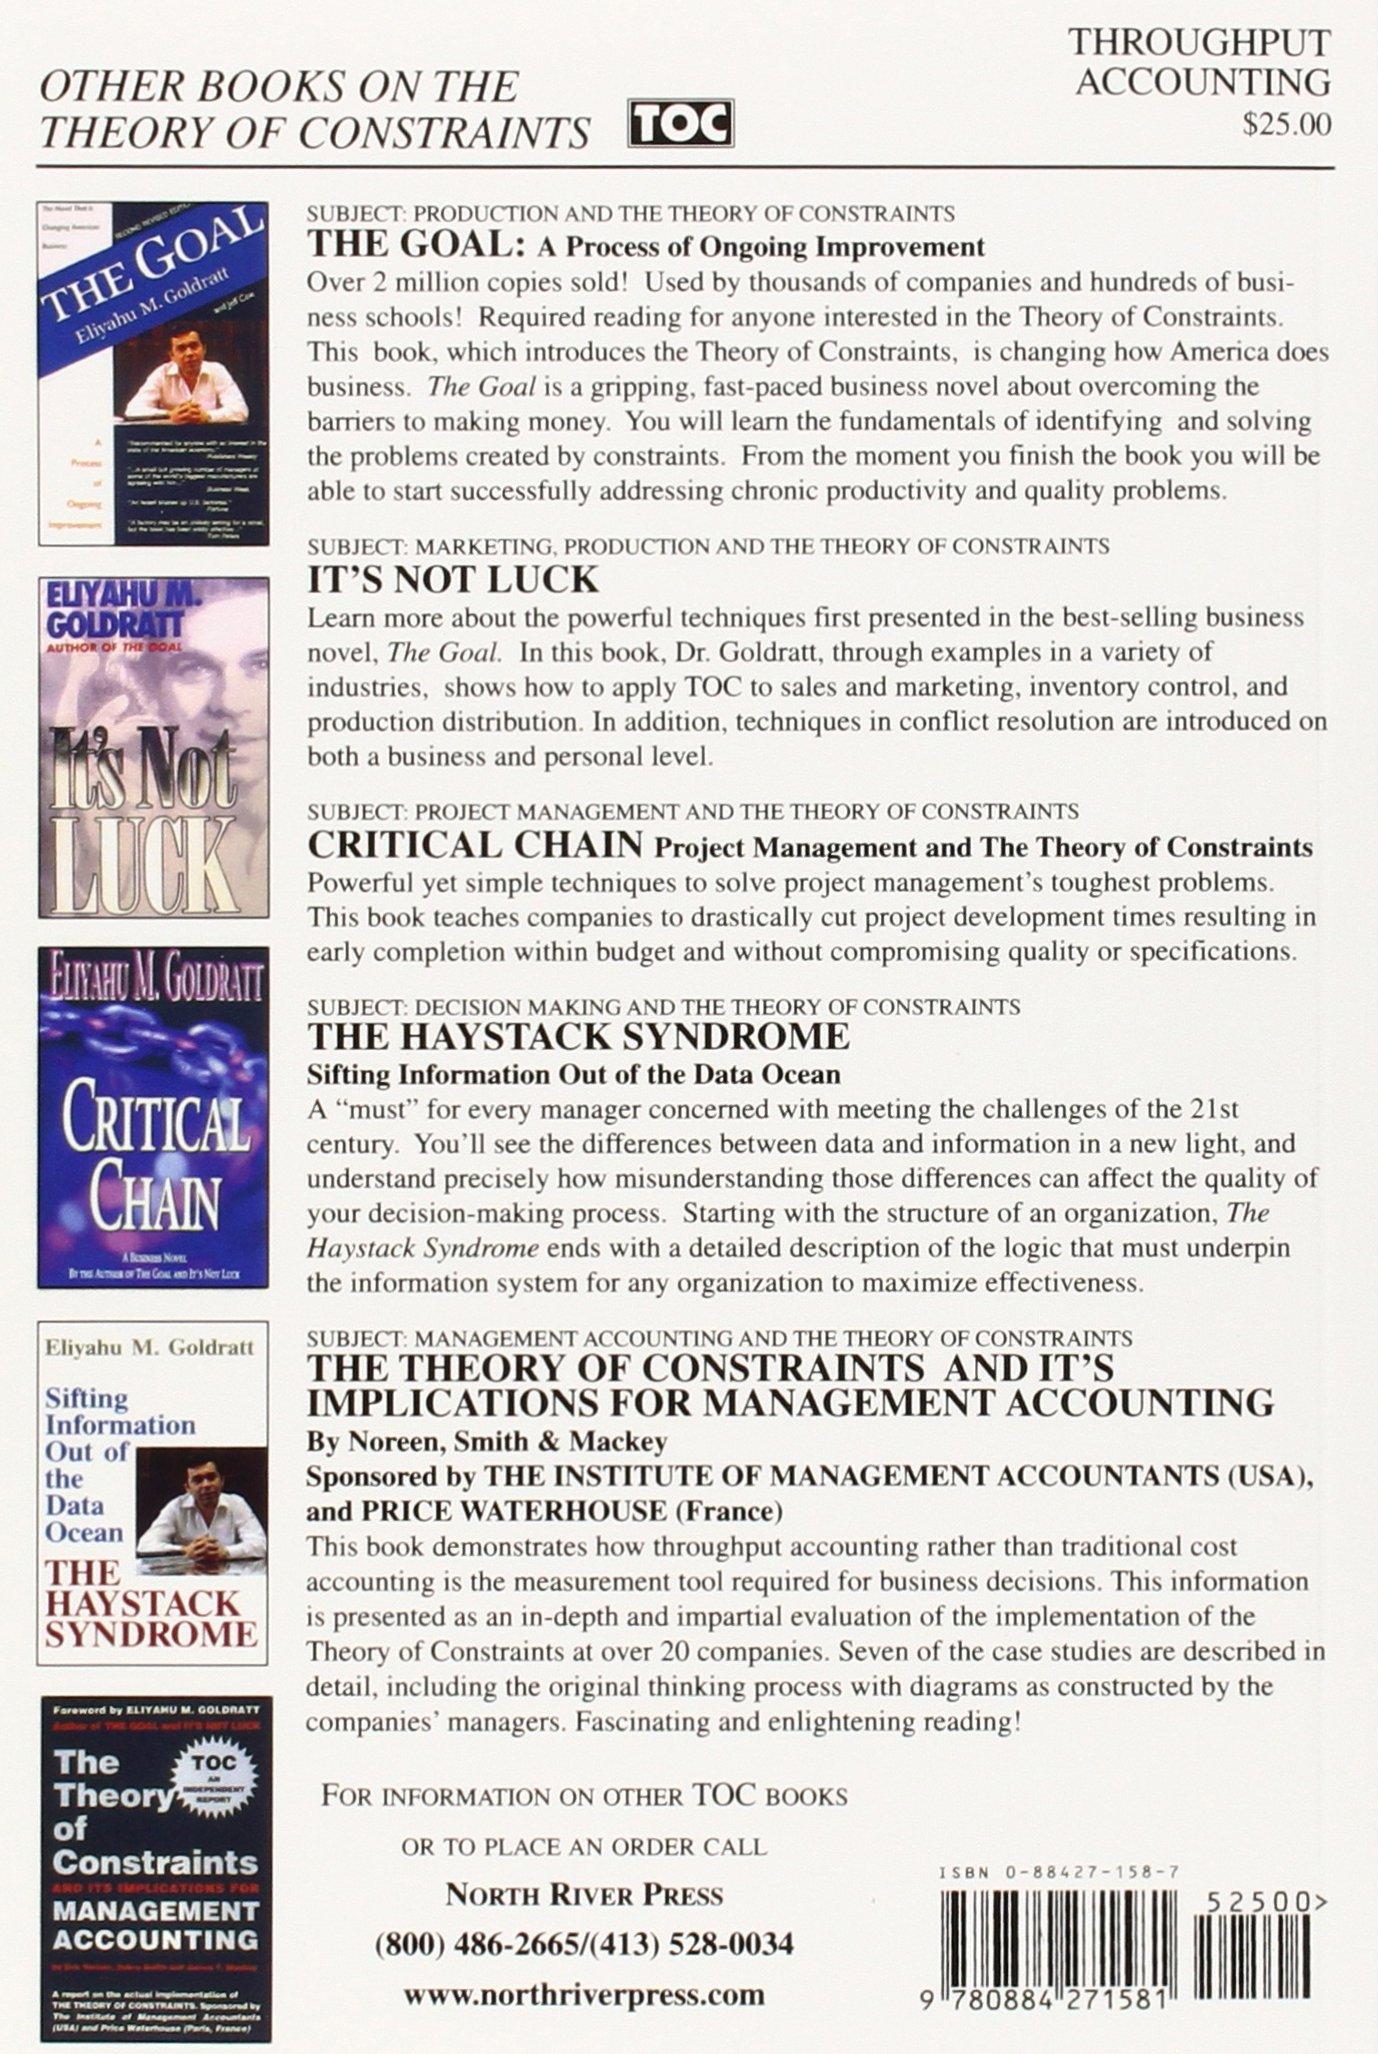 Throughput Accounting: Thomas Corbett: 9780884271581: Amazon: Books